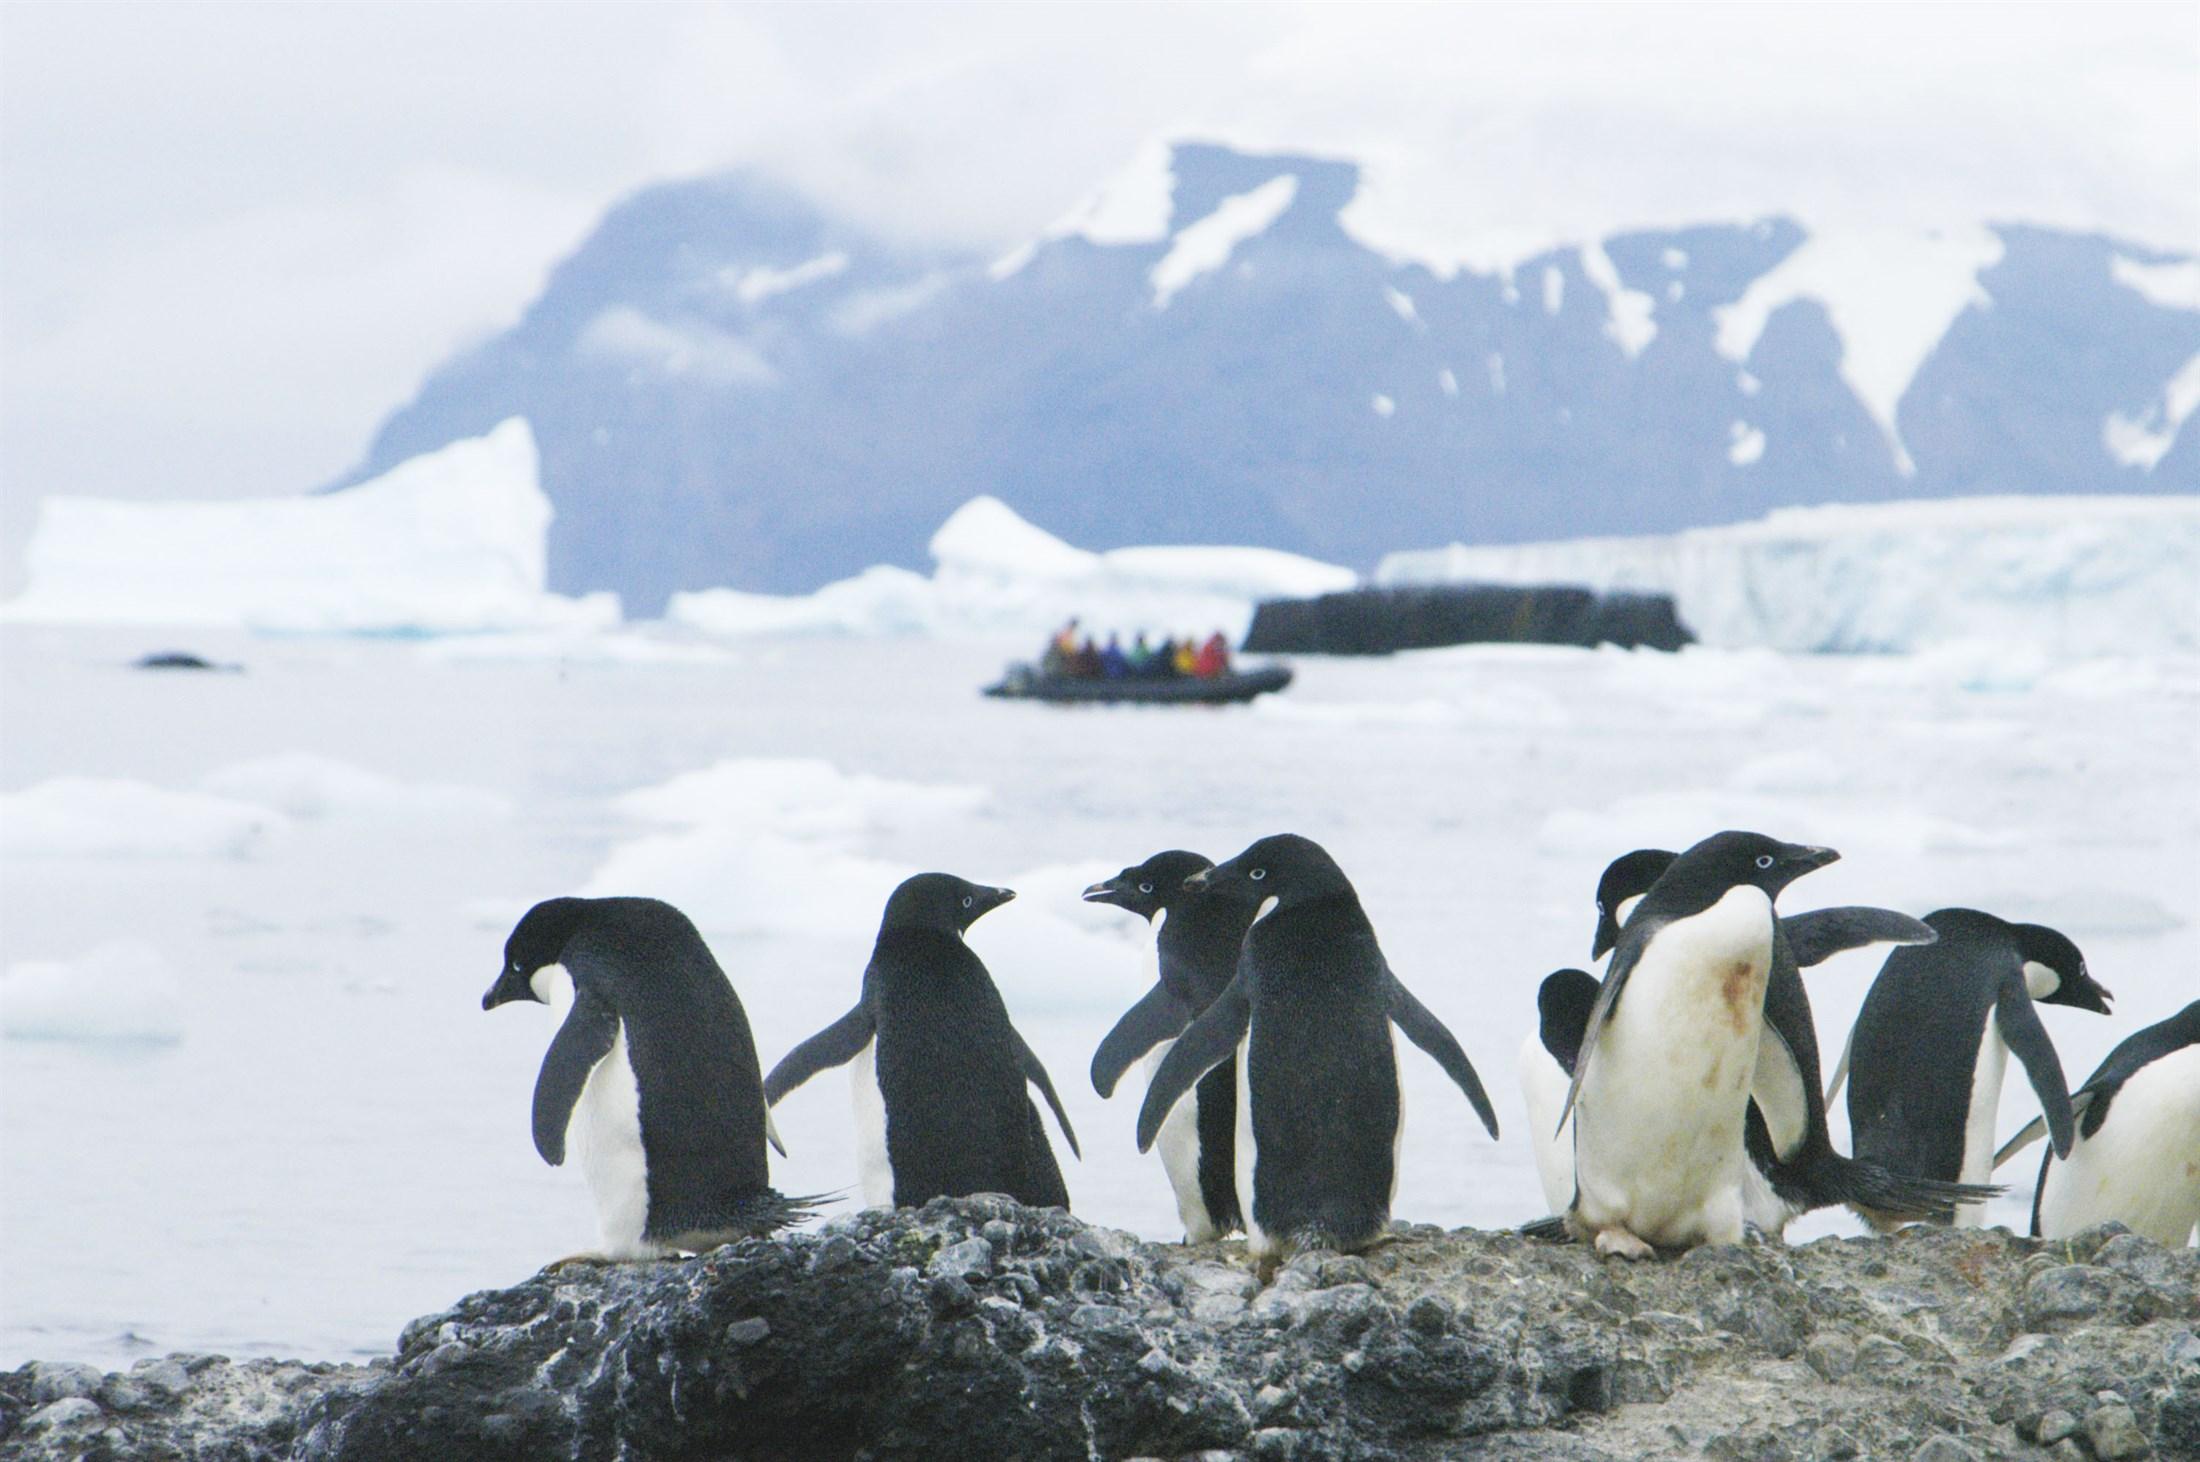 adlie-penguins-pygoscelis-adeliae-with-tourists-in-background-antarctic-peninsula_4bc7-2200x1462px